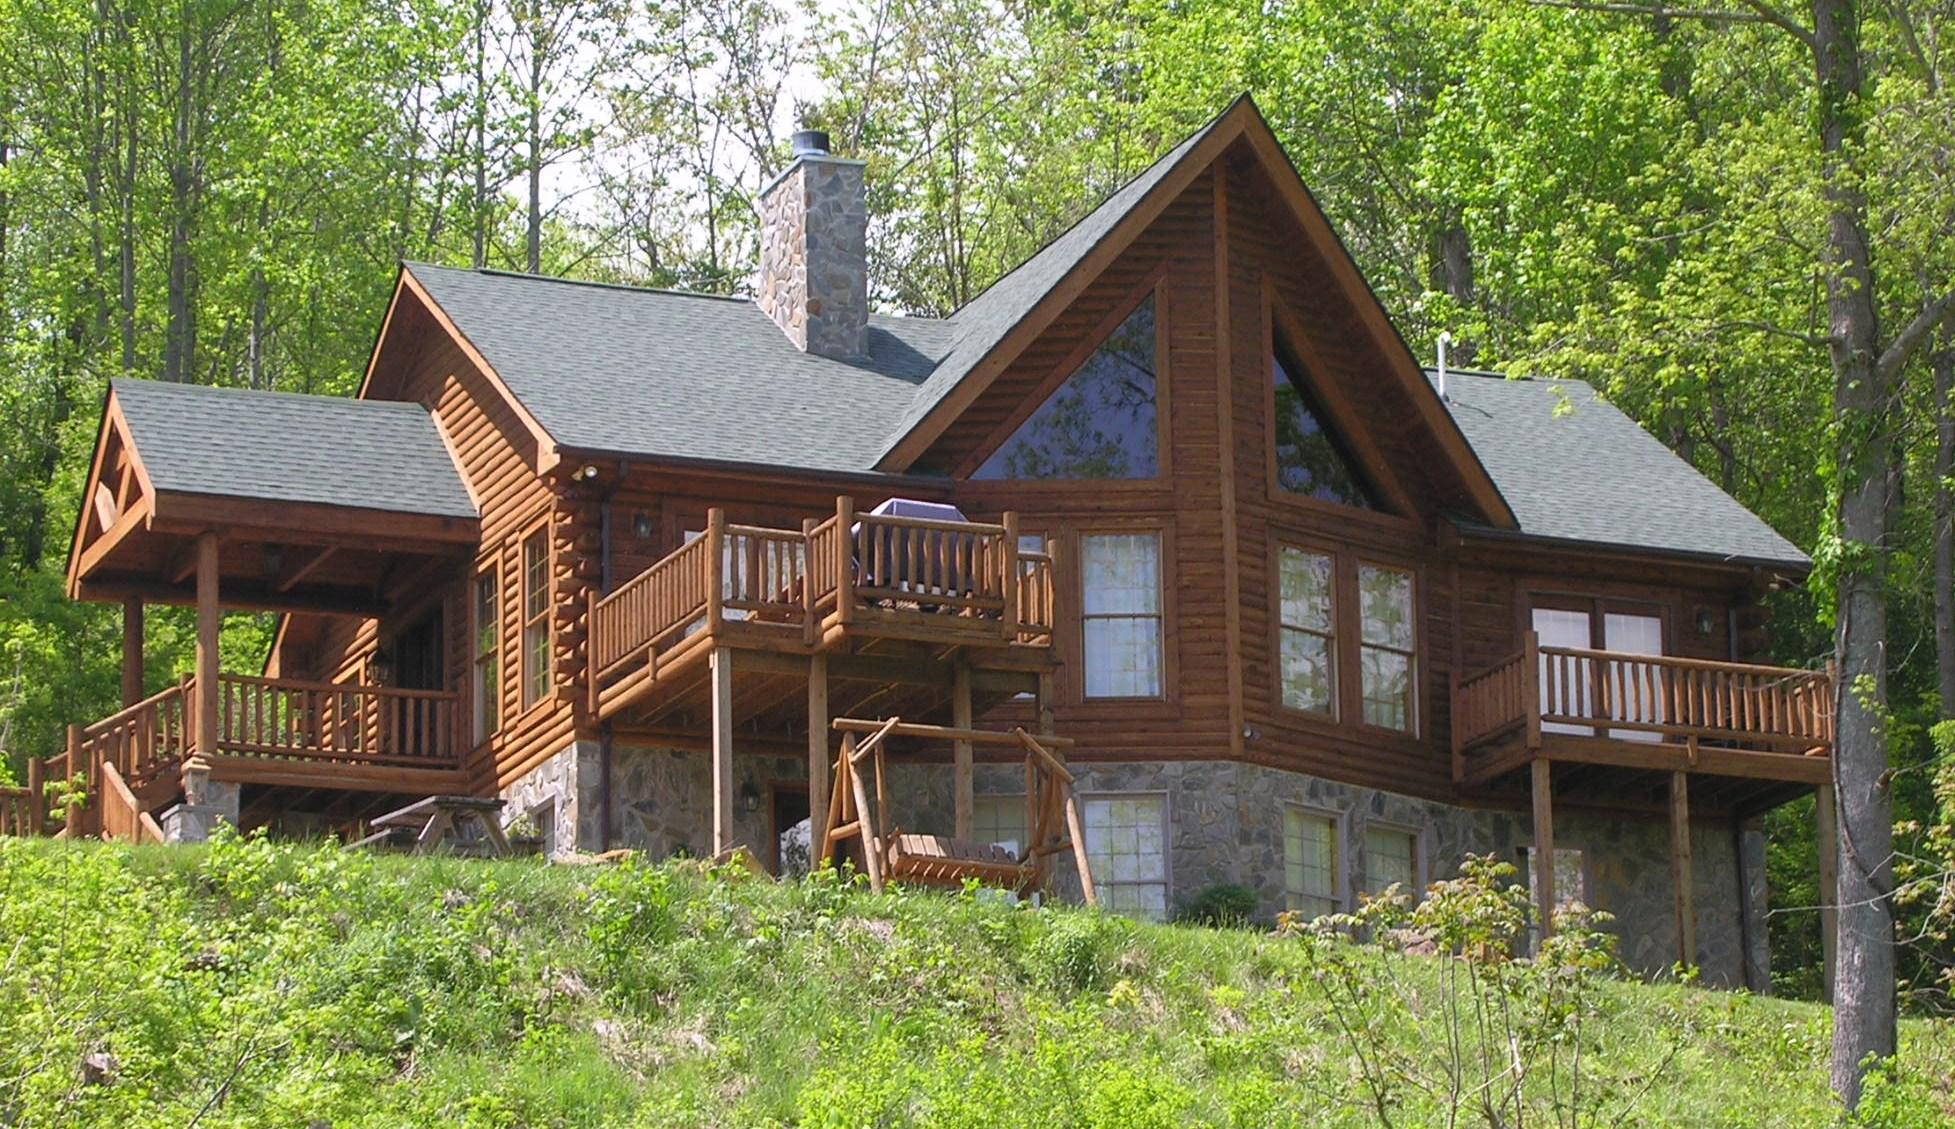 378 Woodland-2009 Main.JPG